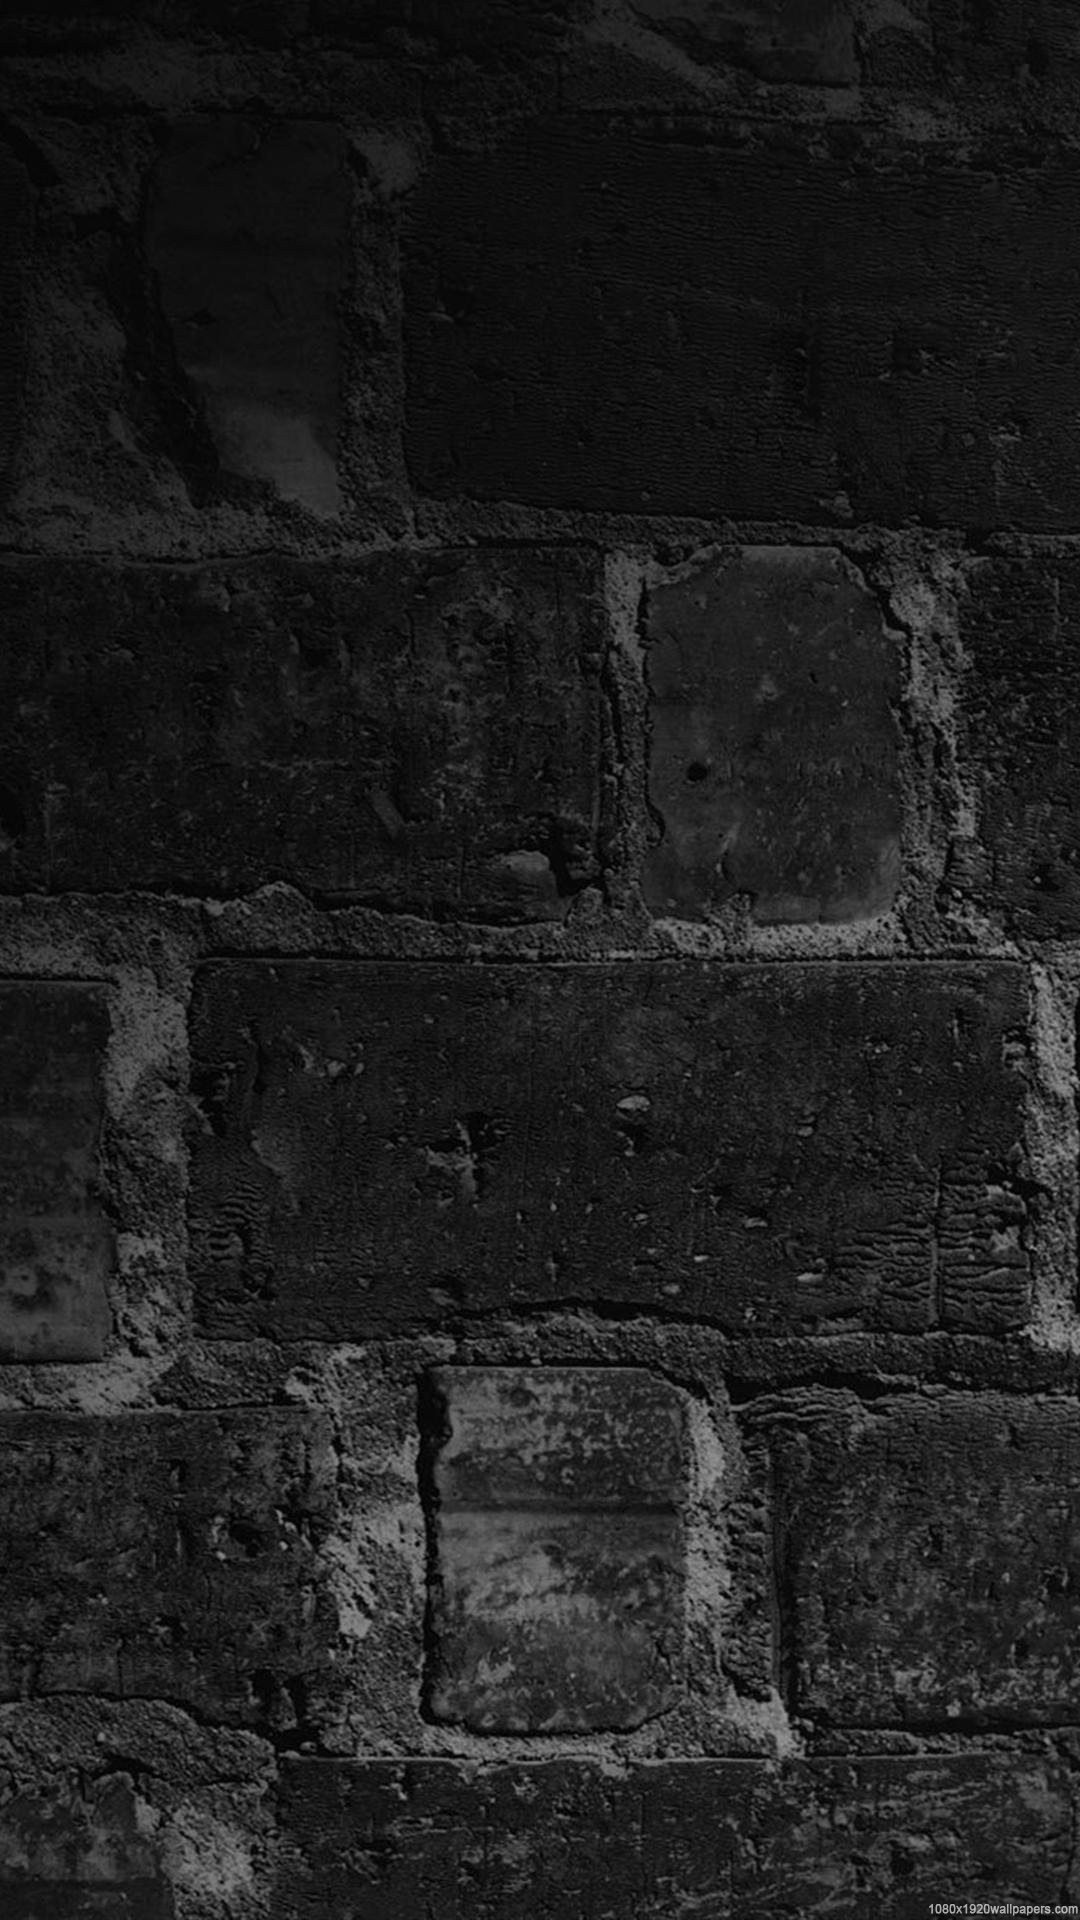 Black And White Wallpaper Iphone 6s Secondtofirstcom